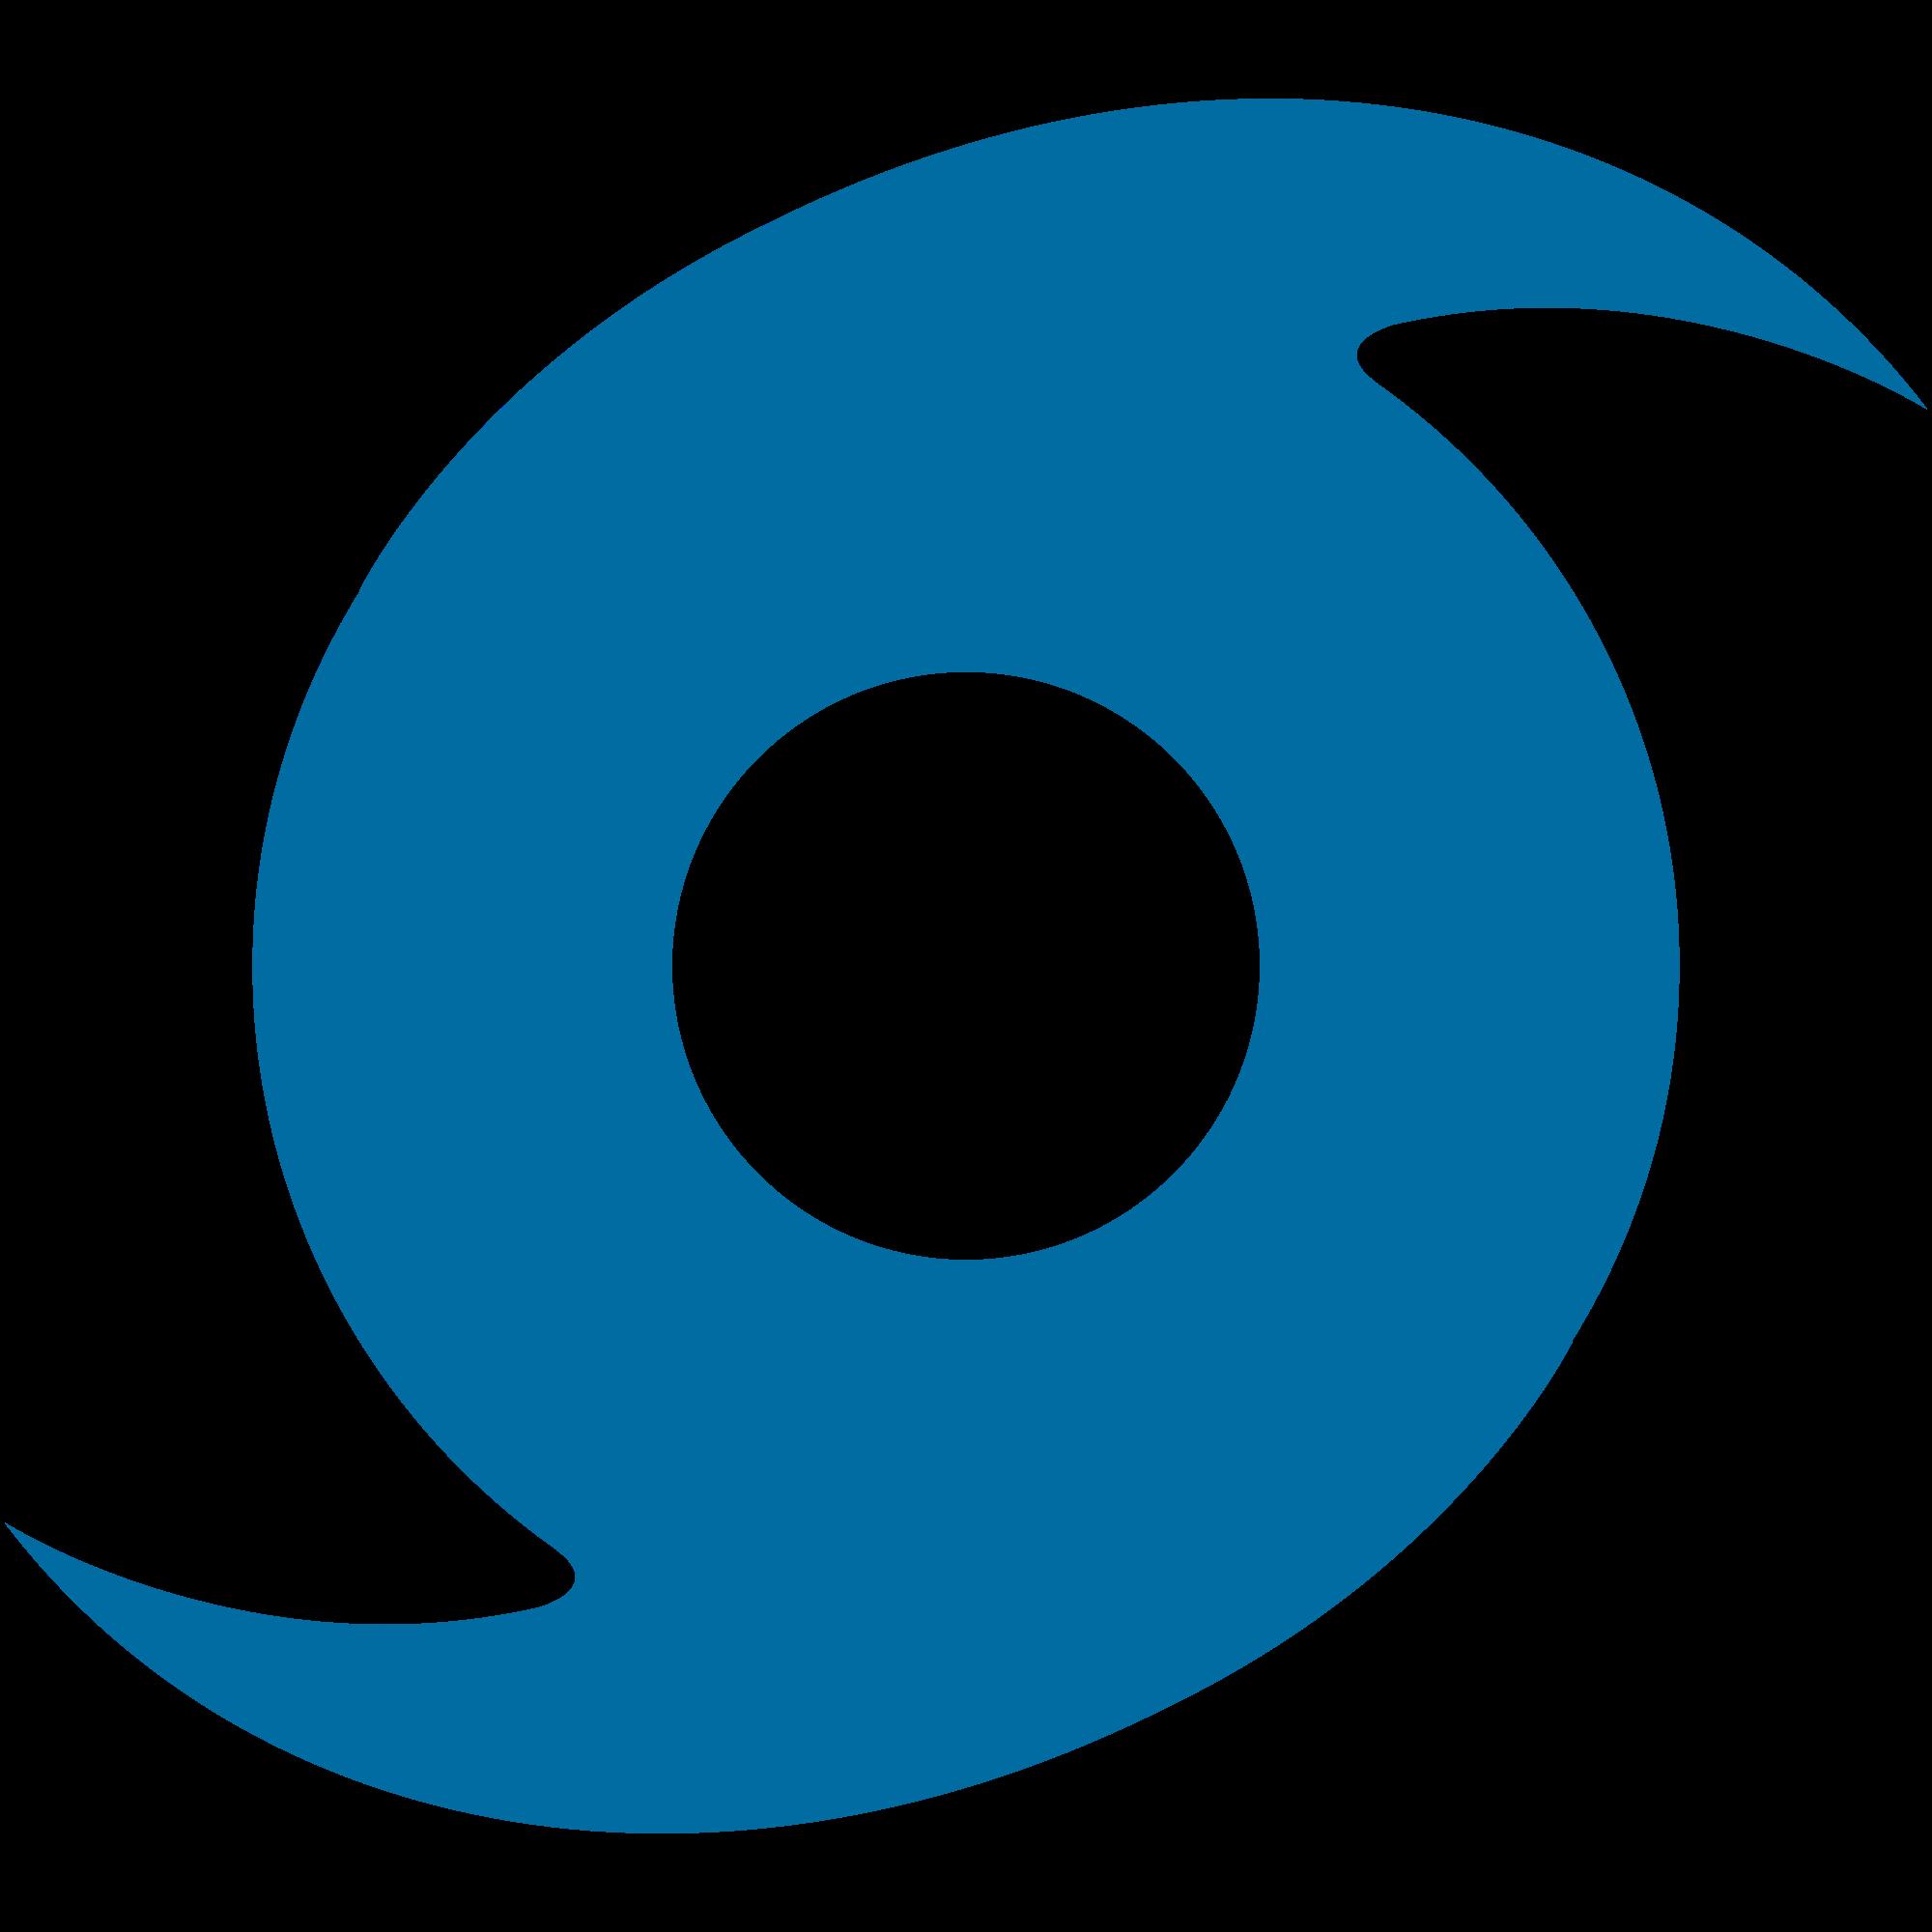 Hurricane clipart emoji, Hurricane emoji Transparent FREE.